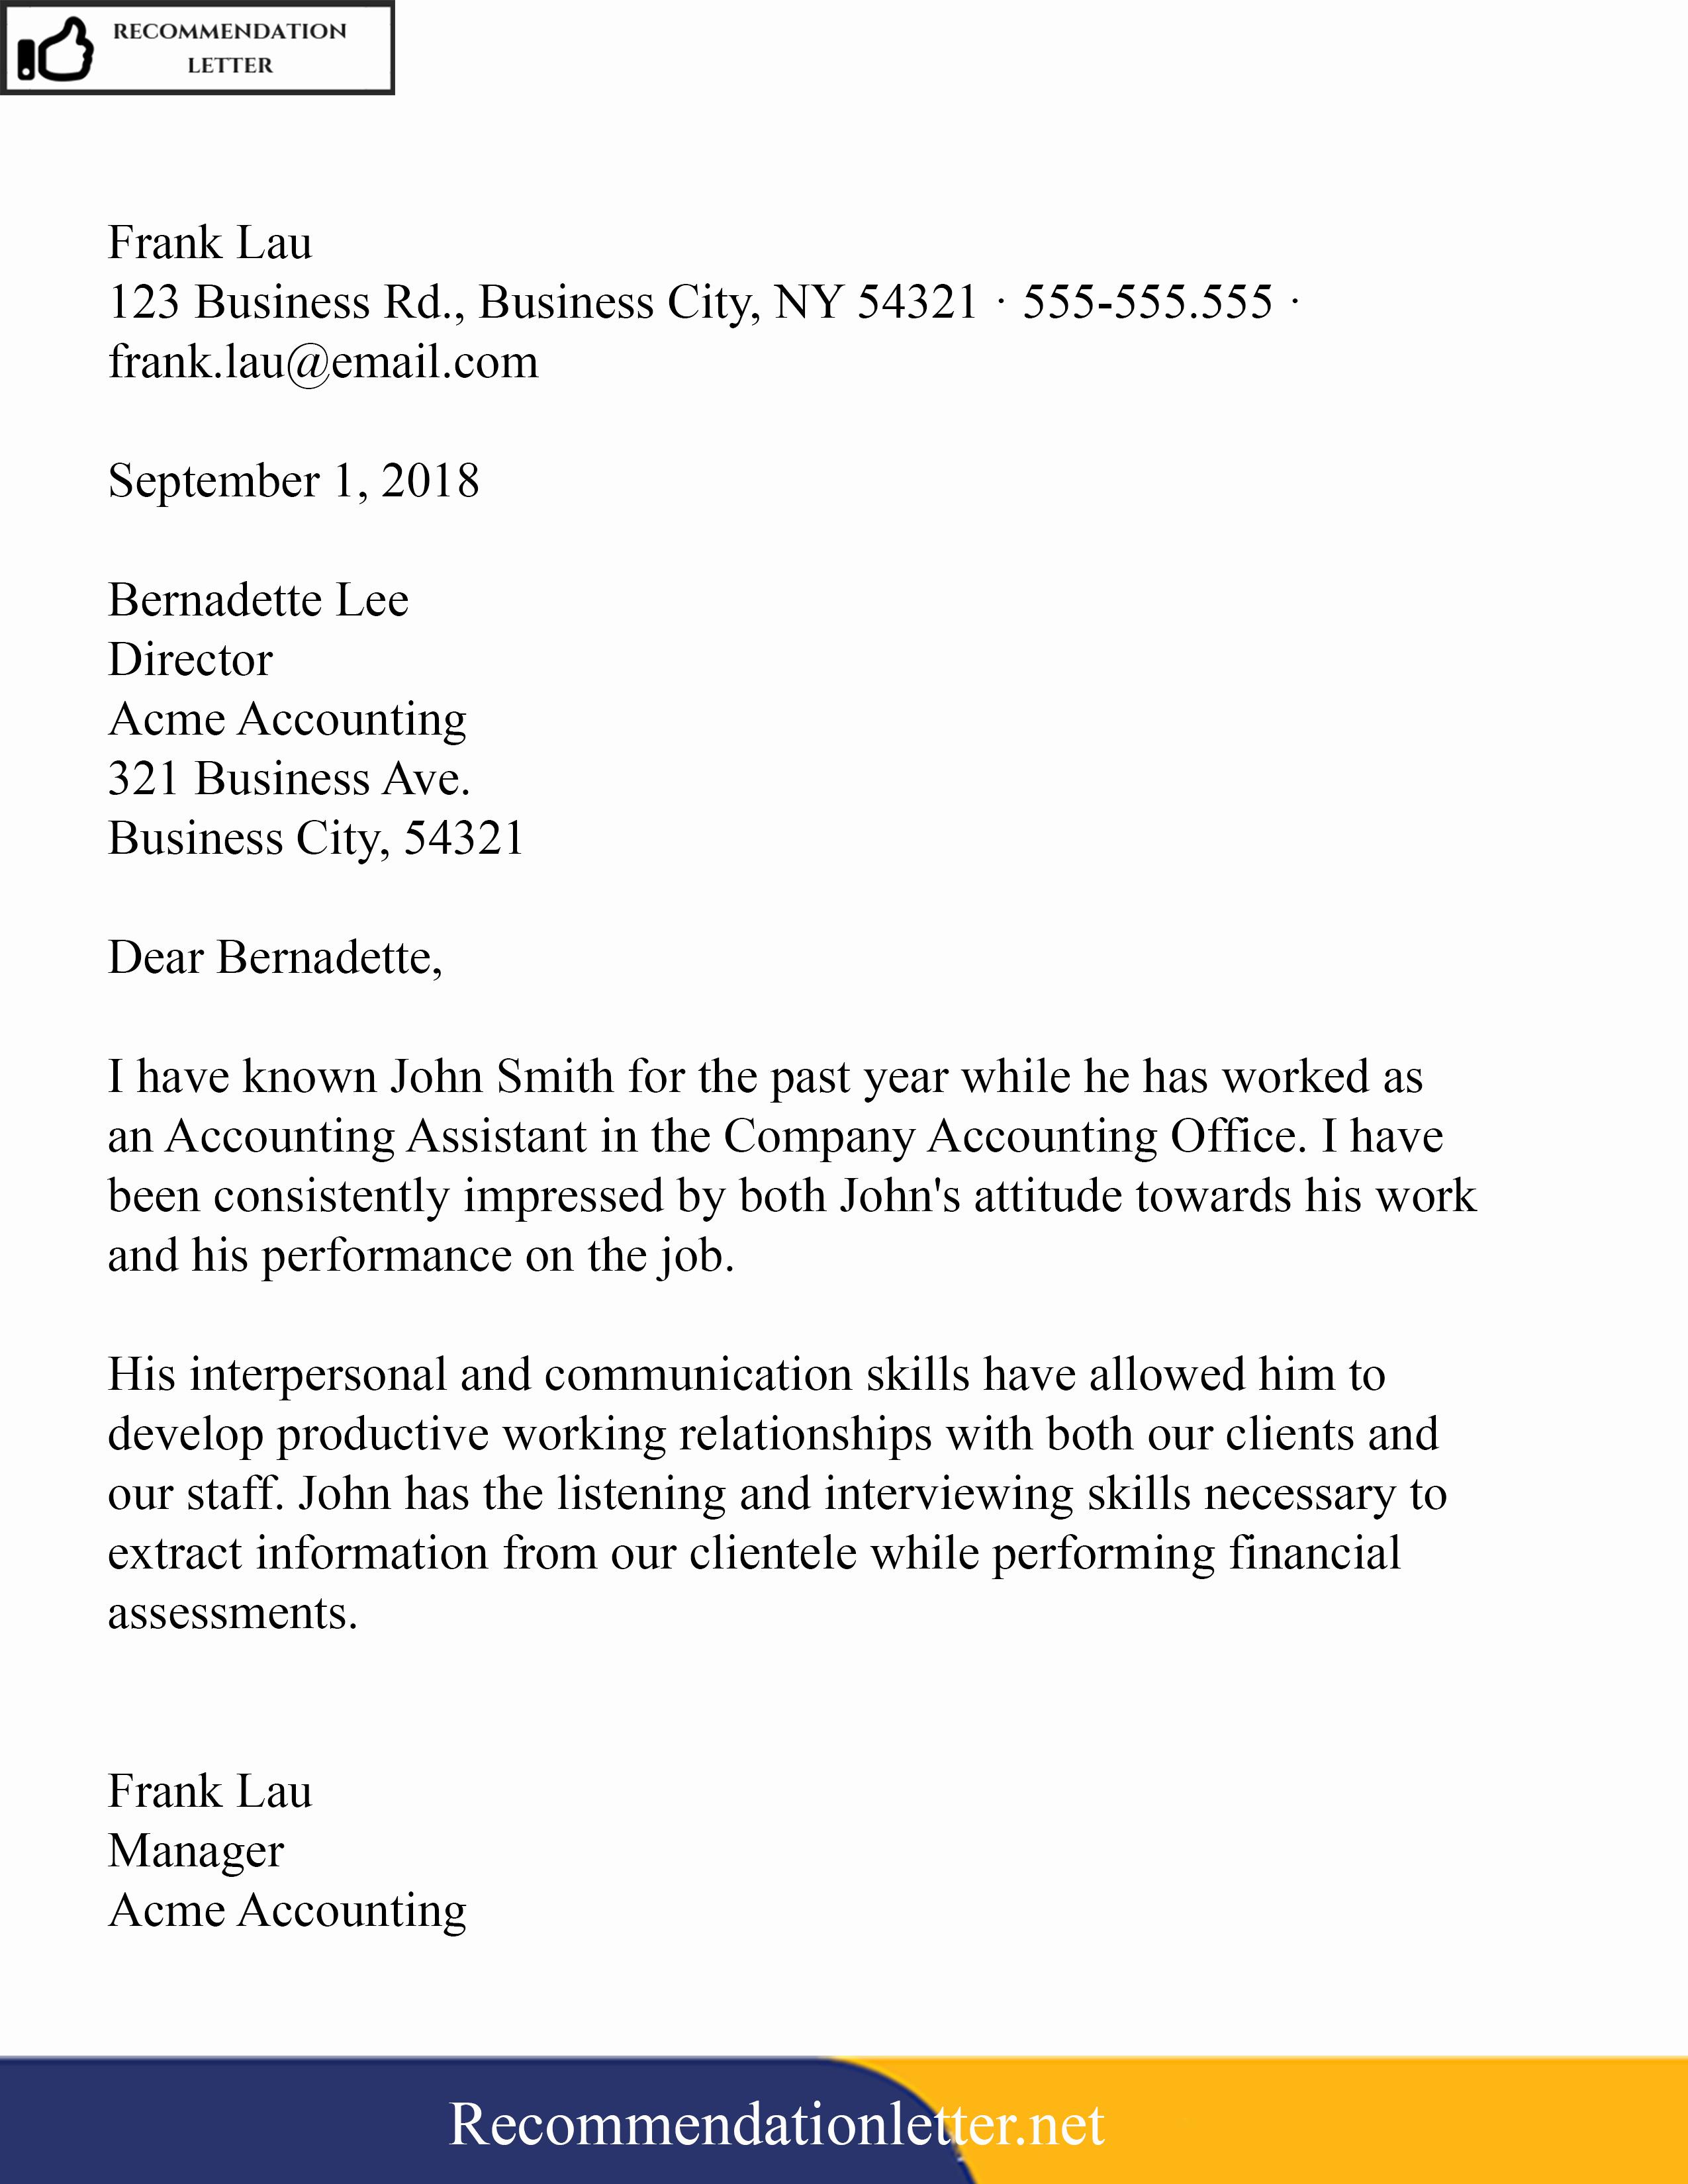 Sample Teacher Recommendation Letter Best Of Sample Template Of Re Mendation Reference Letter for